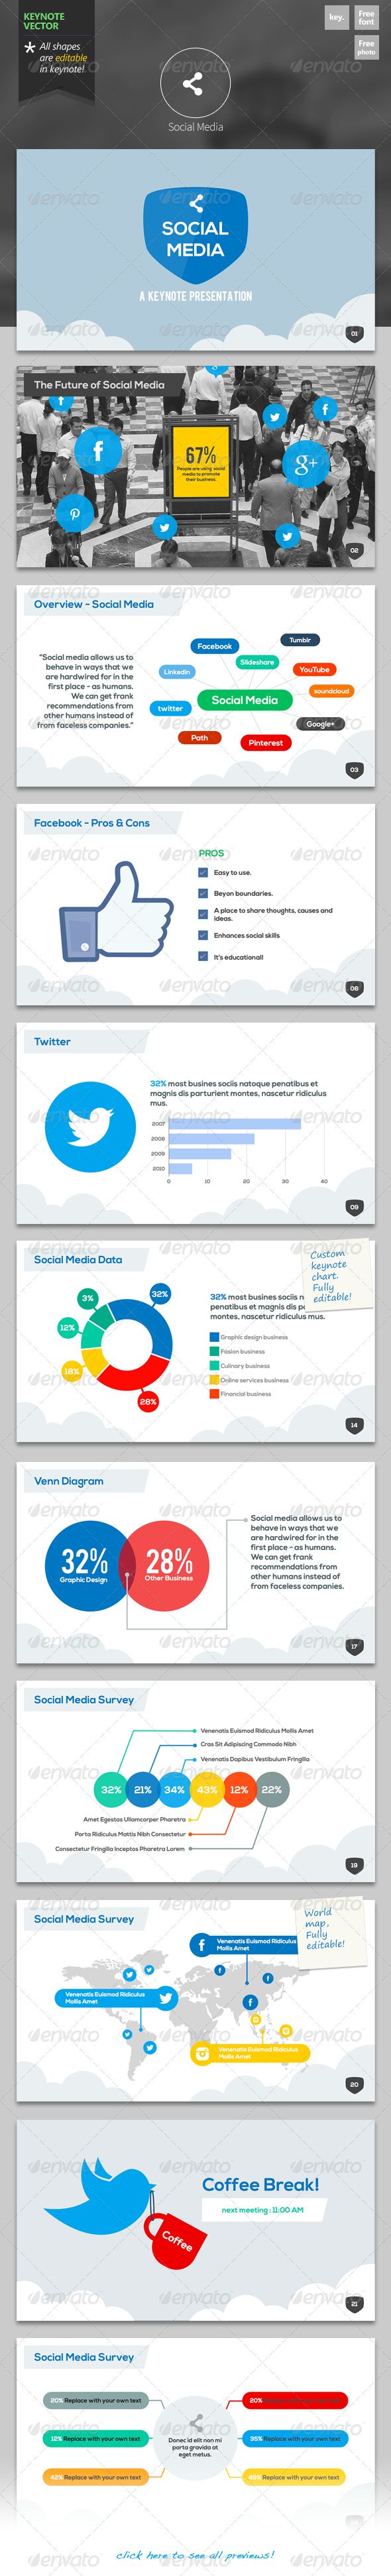 Social Media - Keynote Template | Keynote theme / template